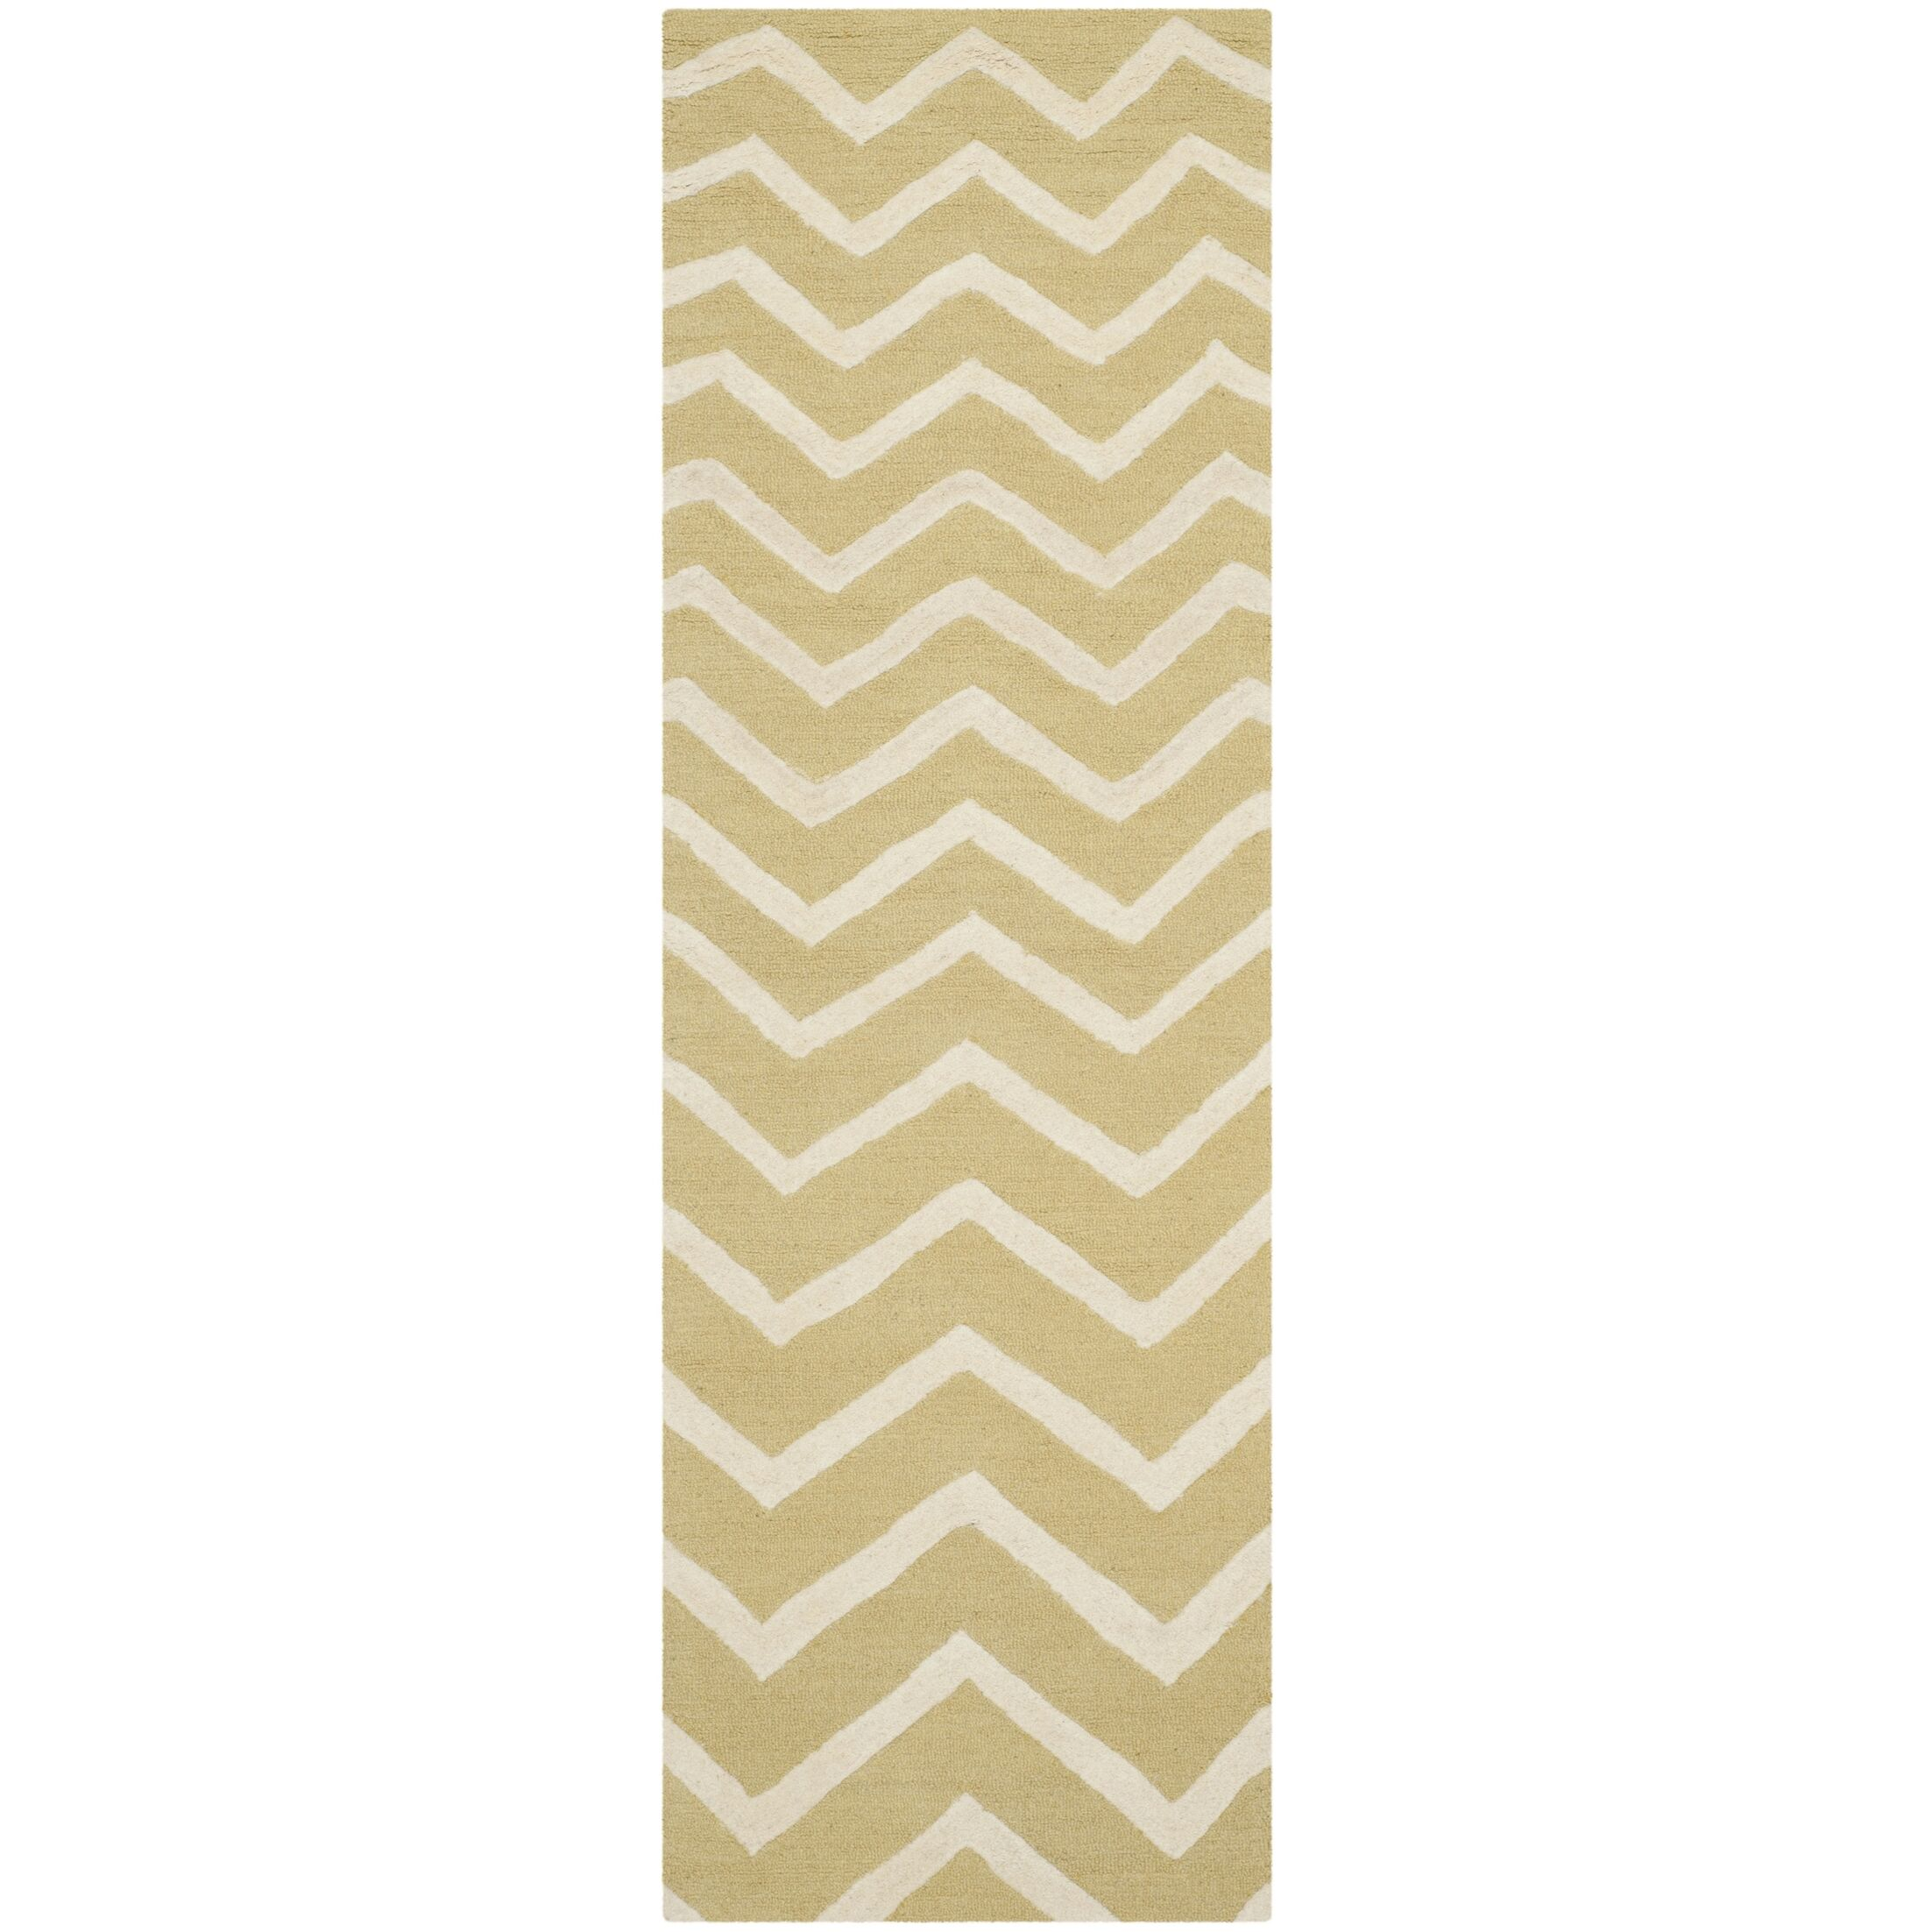 Charlenne Hand-Tufted Wool Light Gold/Ivory Area Rug Rug Size: Runner 2'6